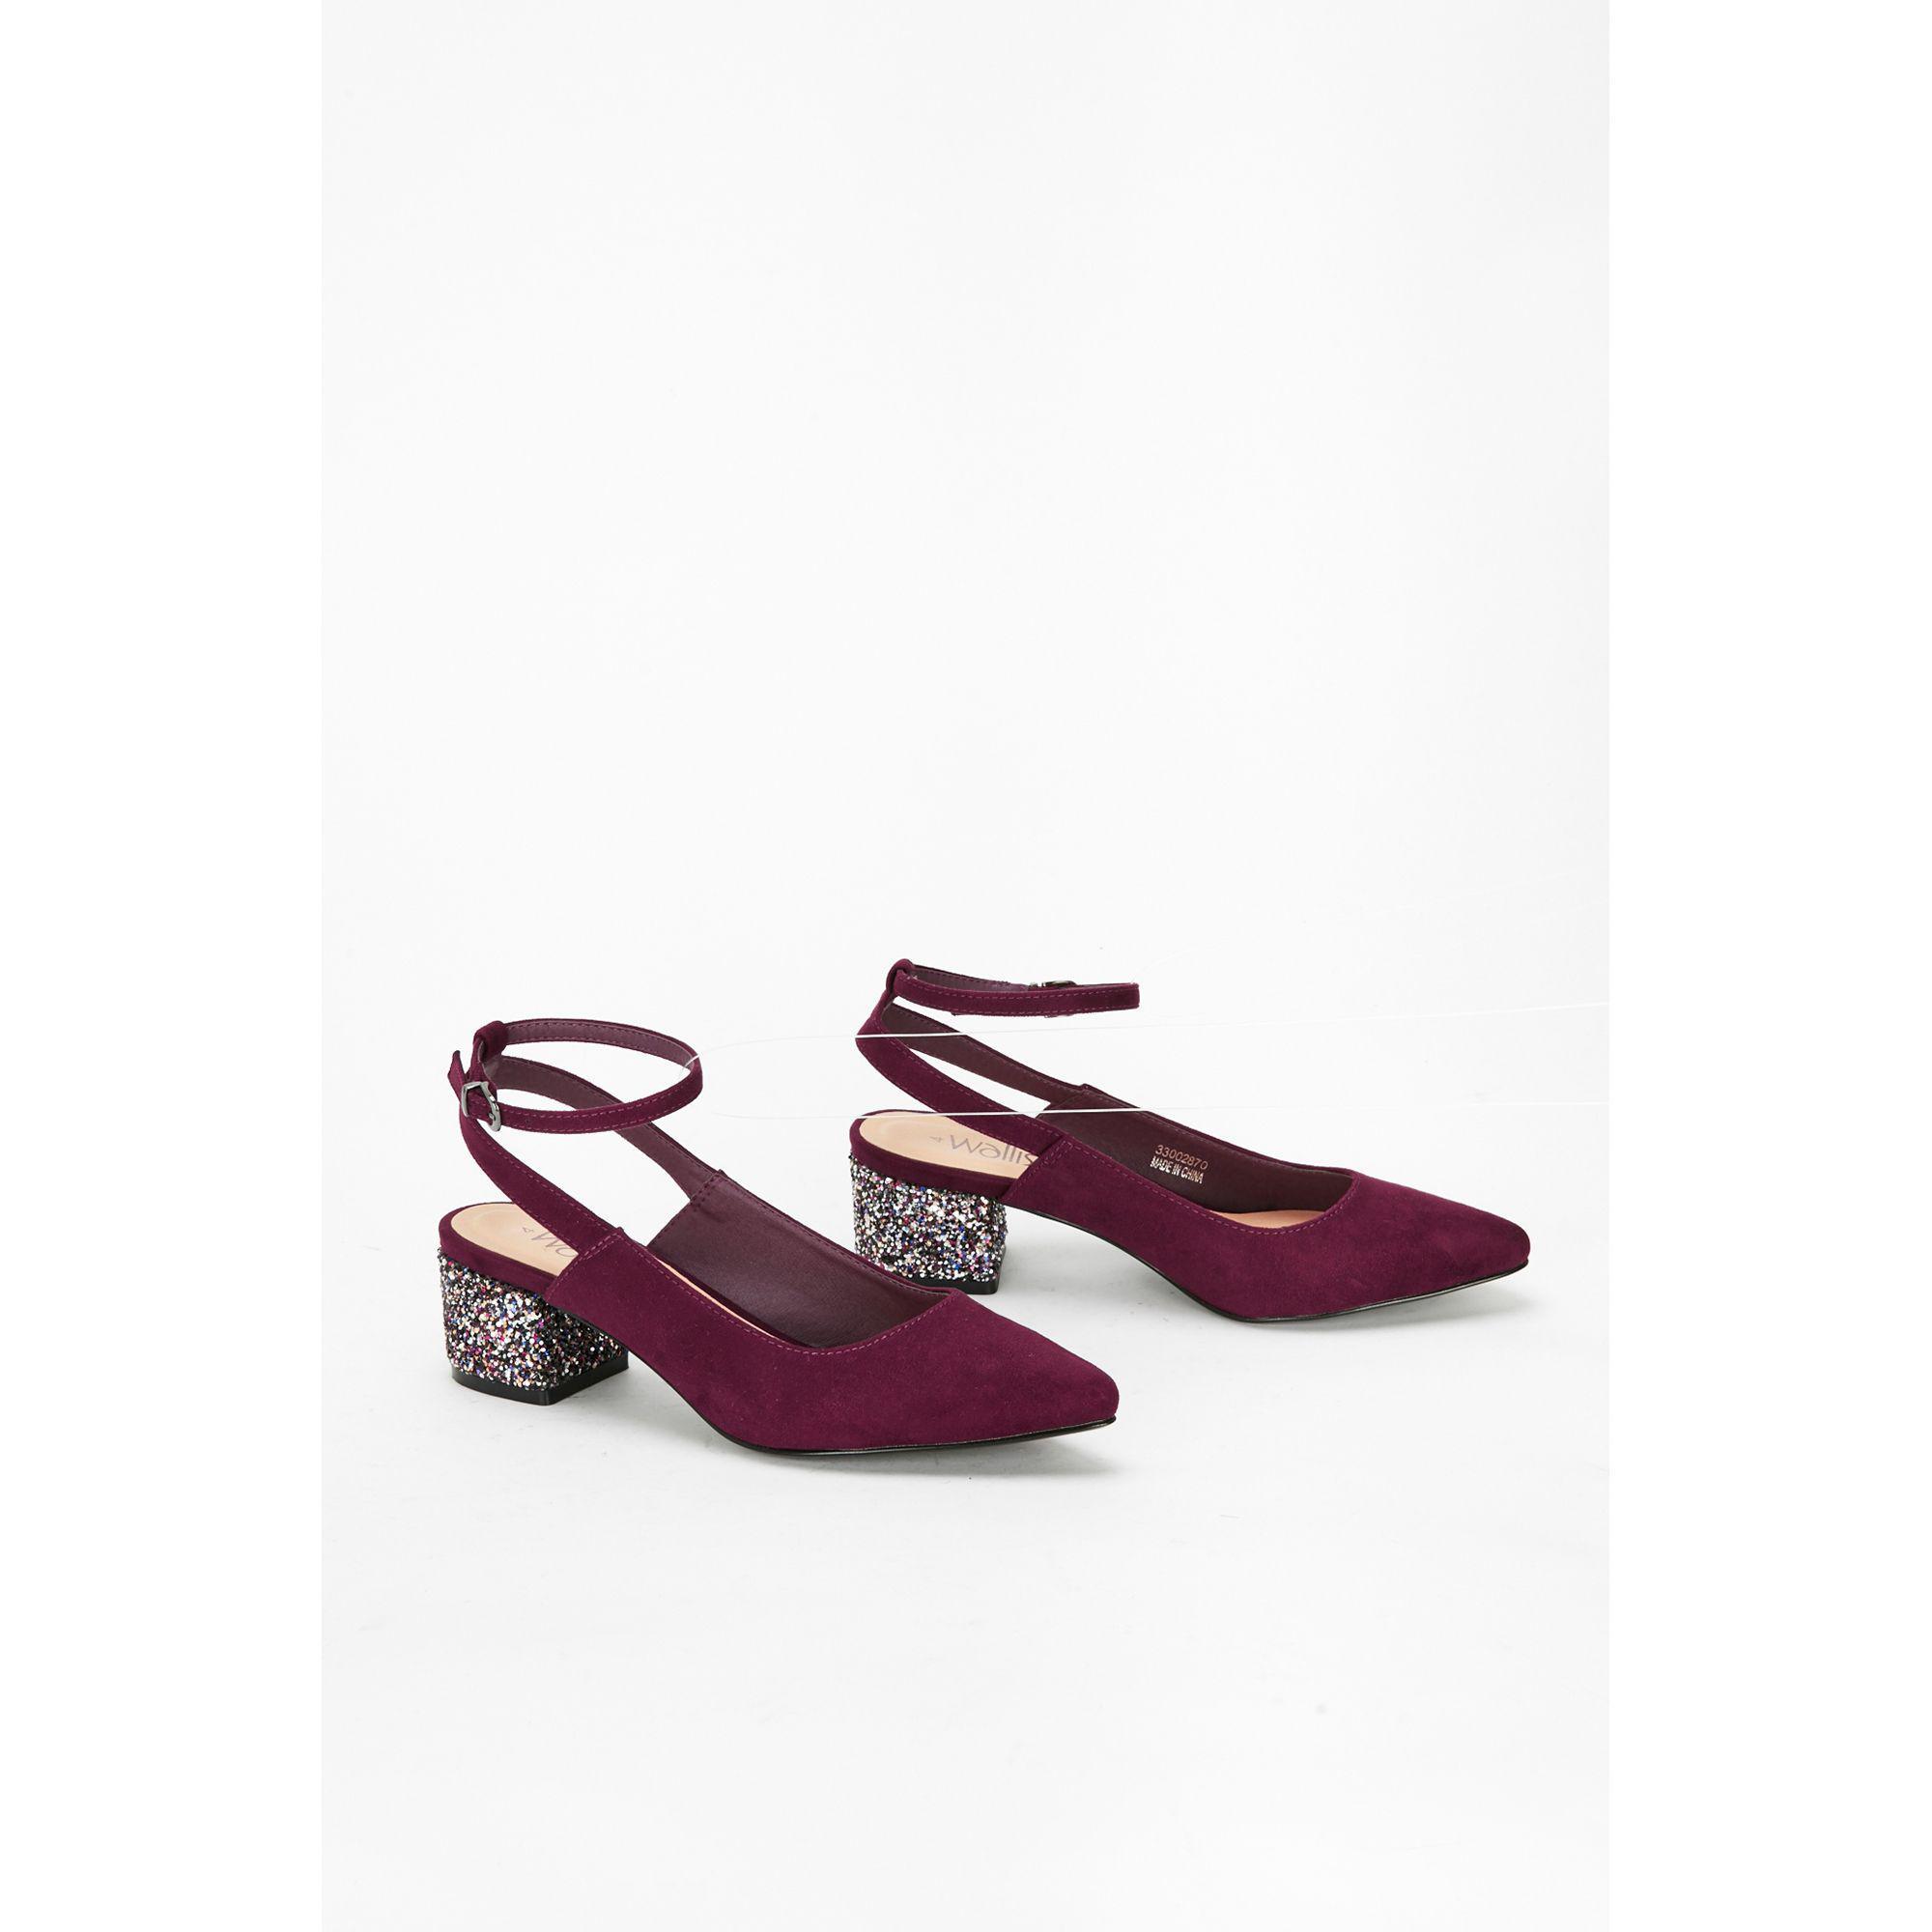 3579c7df57956 ... Berry Glitter Heel Ankle Strap Sandals - Lyst. View fullscreen